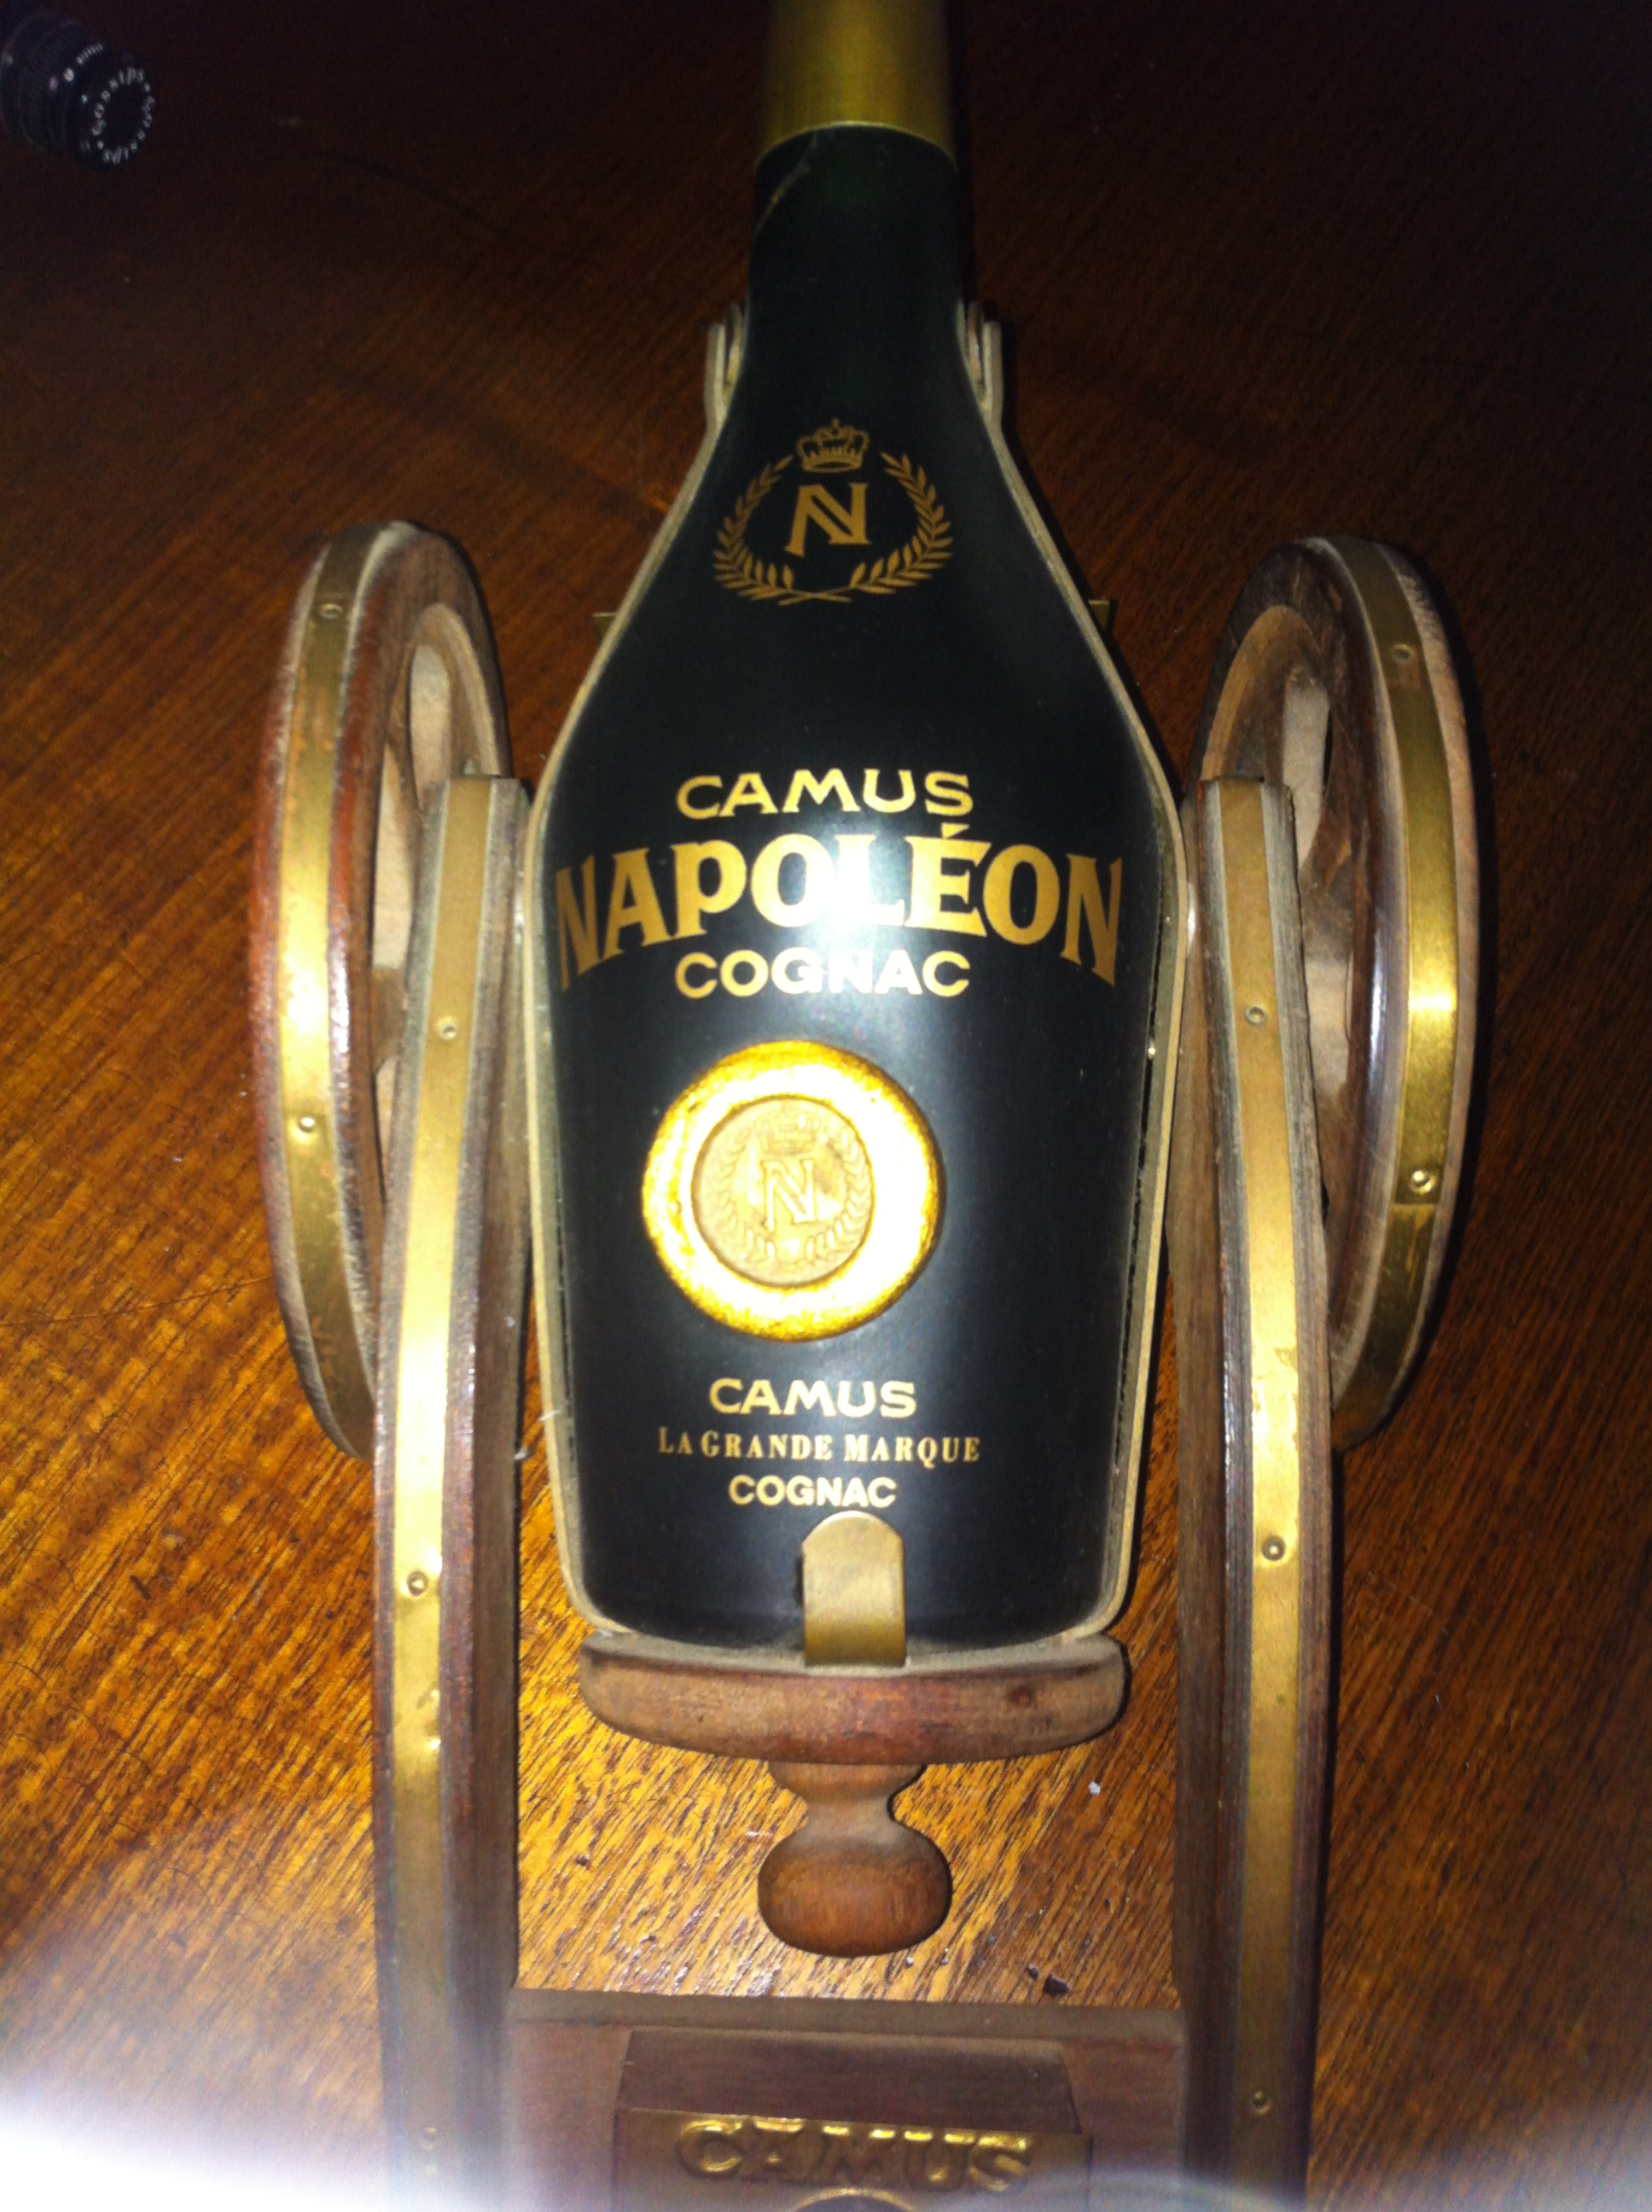 Rare Camus Cognac Bottle in wooden trolley